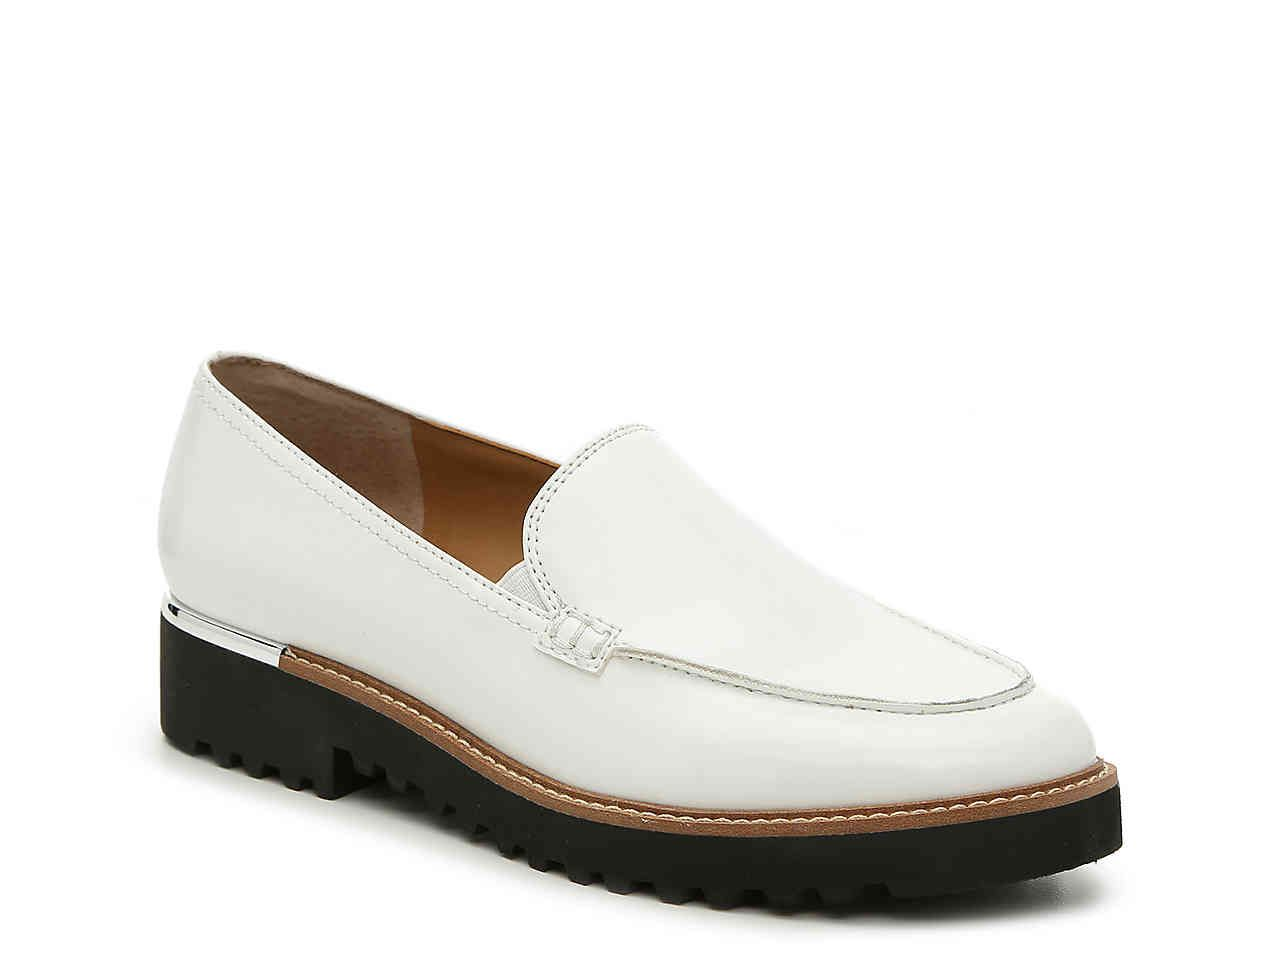 b85886084b1 Women Cypress Loafer -White